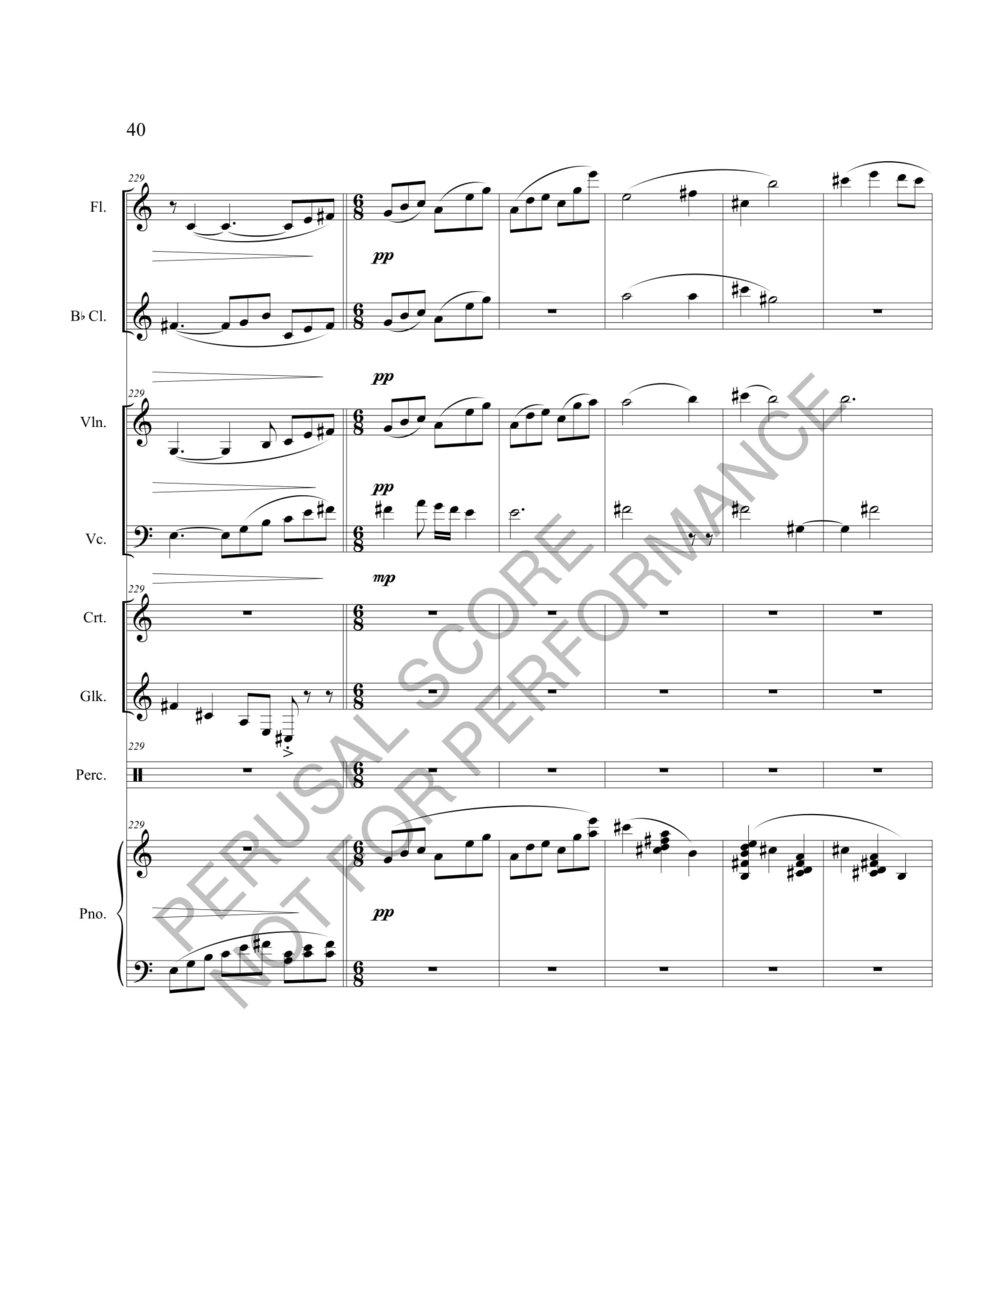 Boyd Terra Liberi Score-watermark-46.jpg